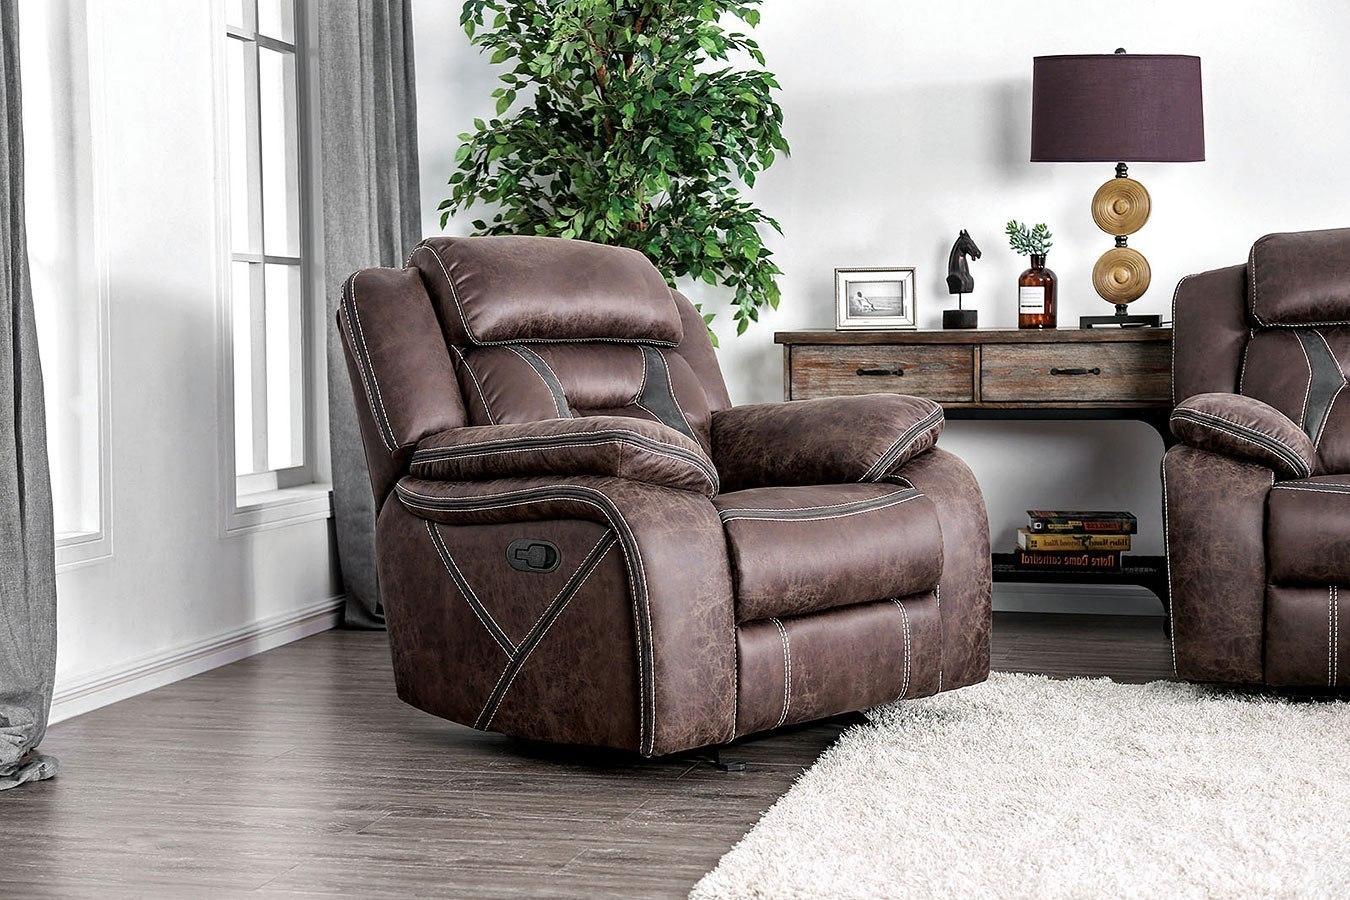 Flint Office Furniture: Flint Recliner By Furniture Of America